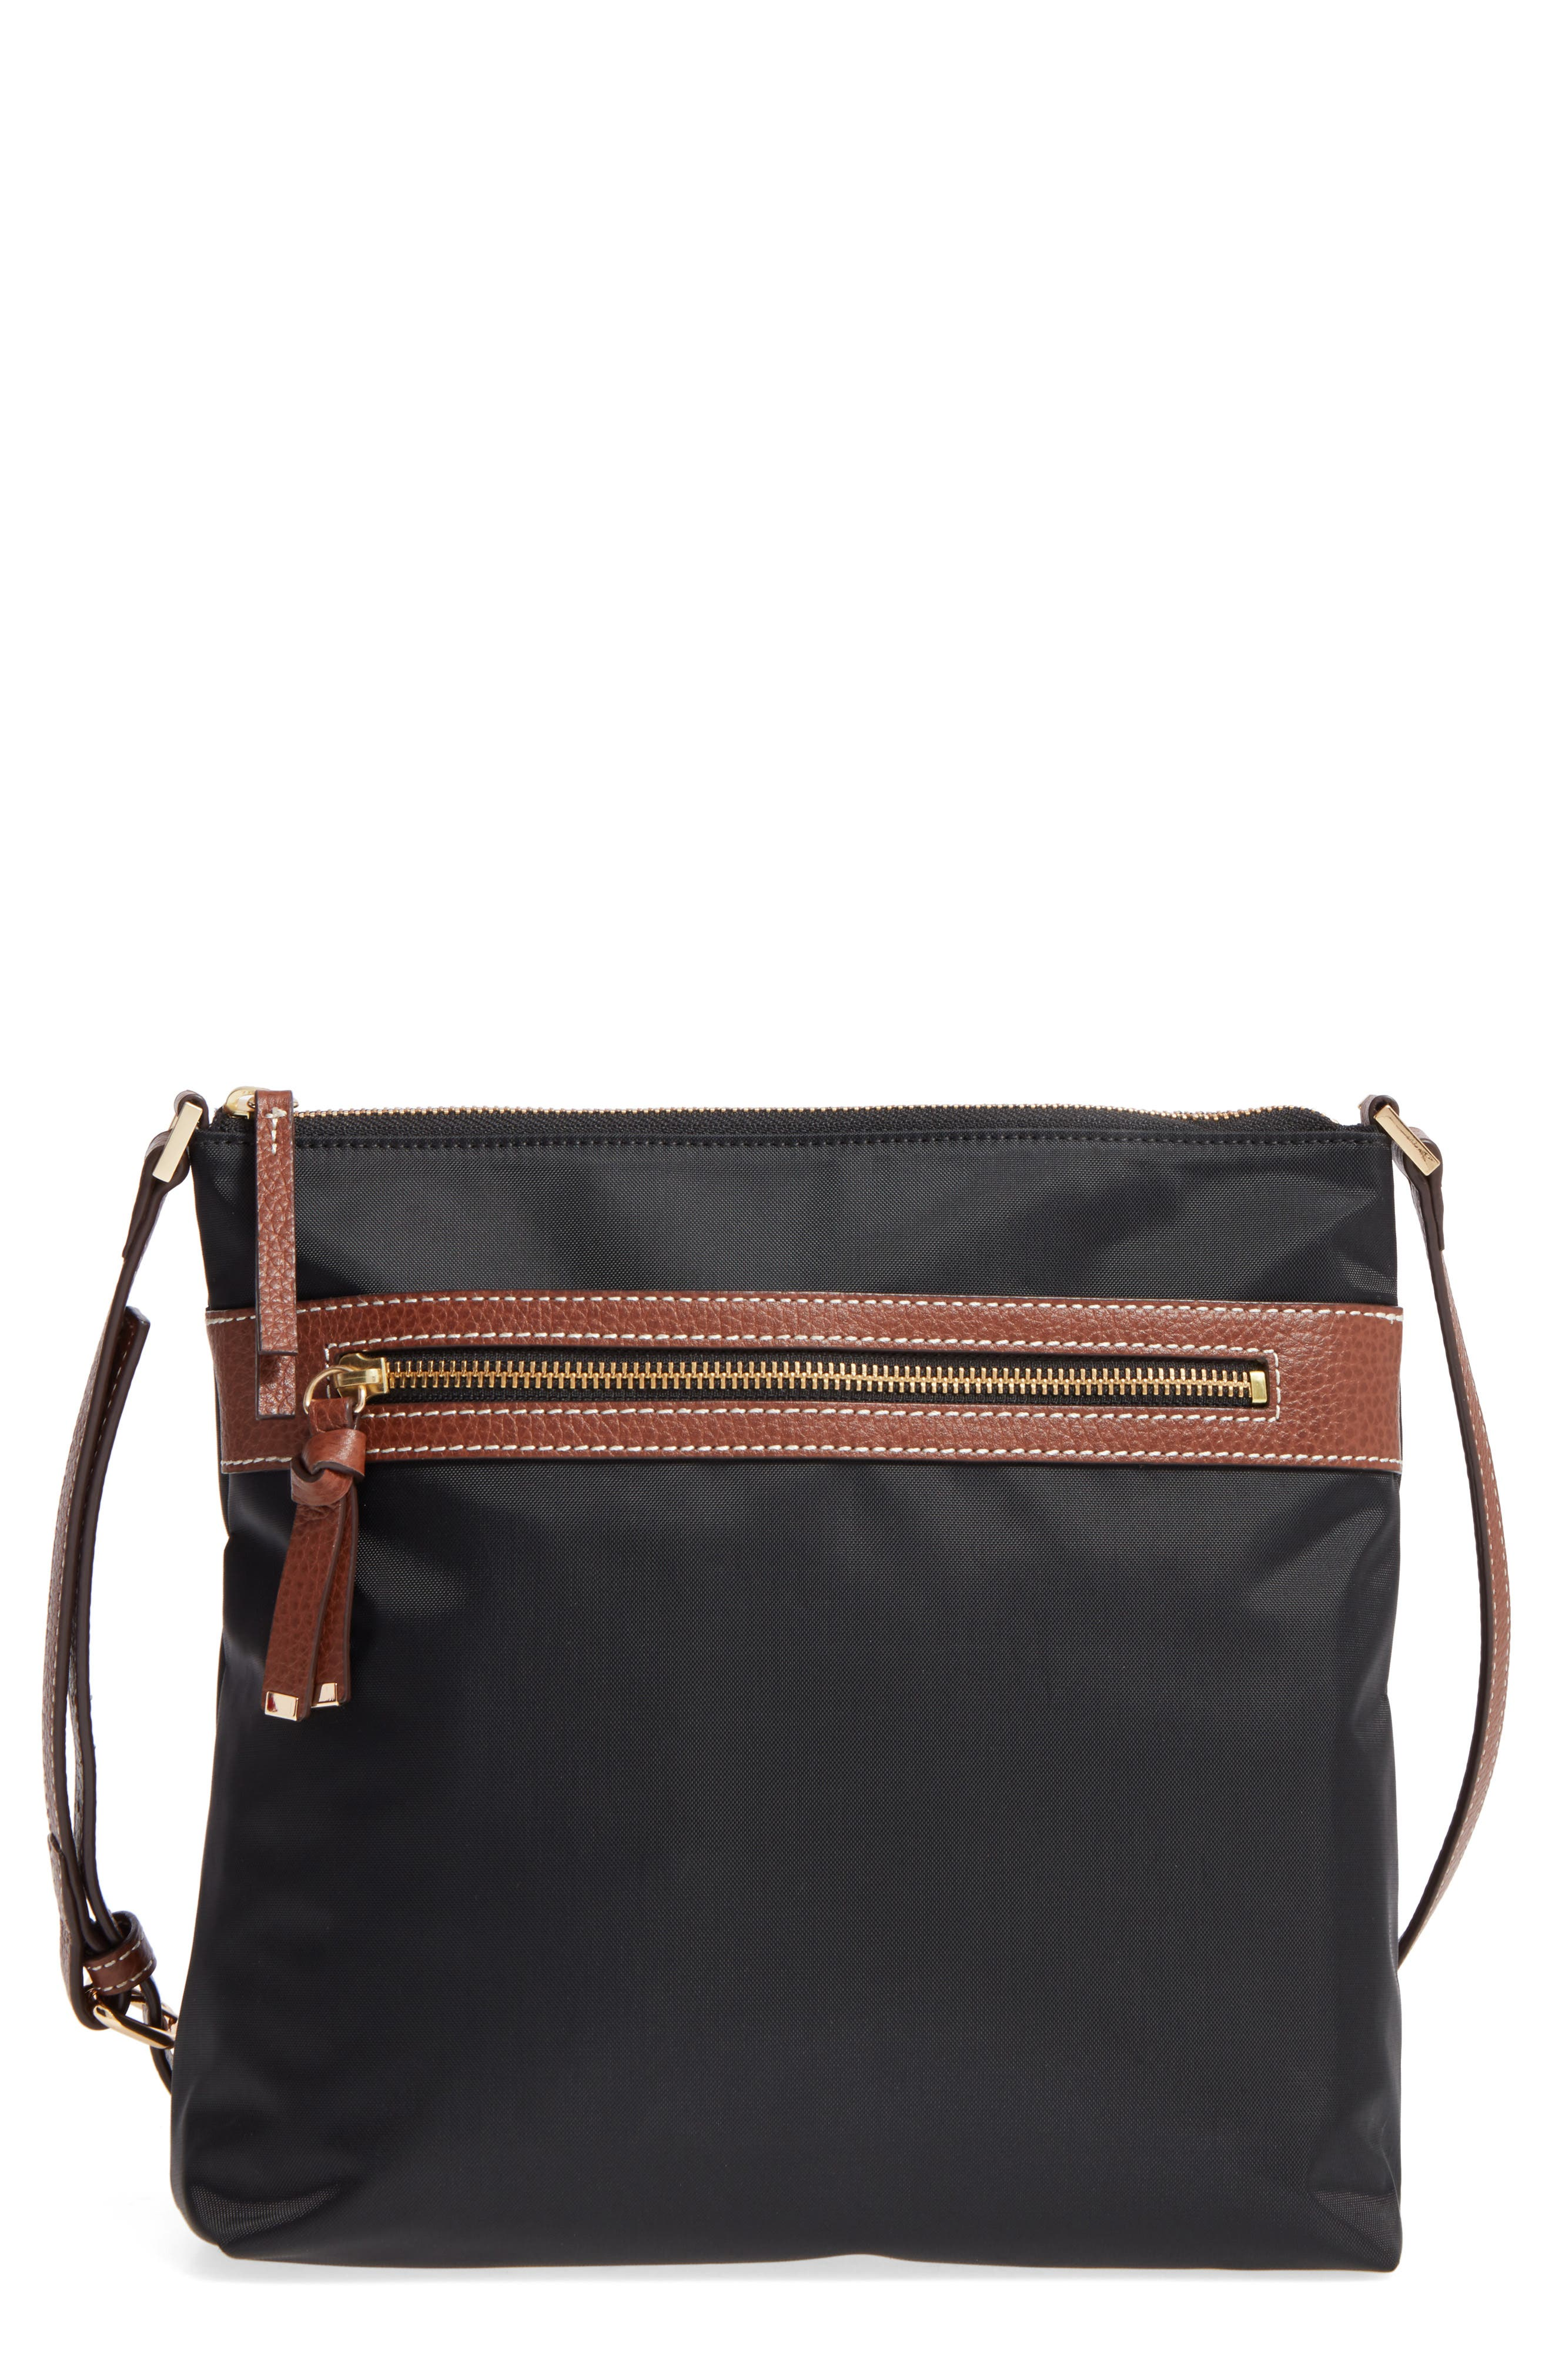 Halogen Nylon Crossbody Bag,                             Main thumbnail 1, color,                             001